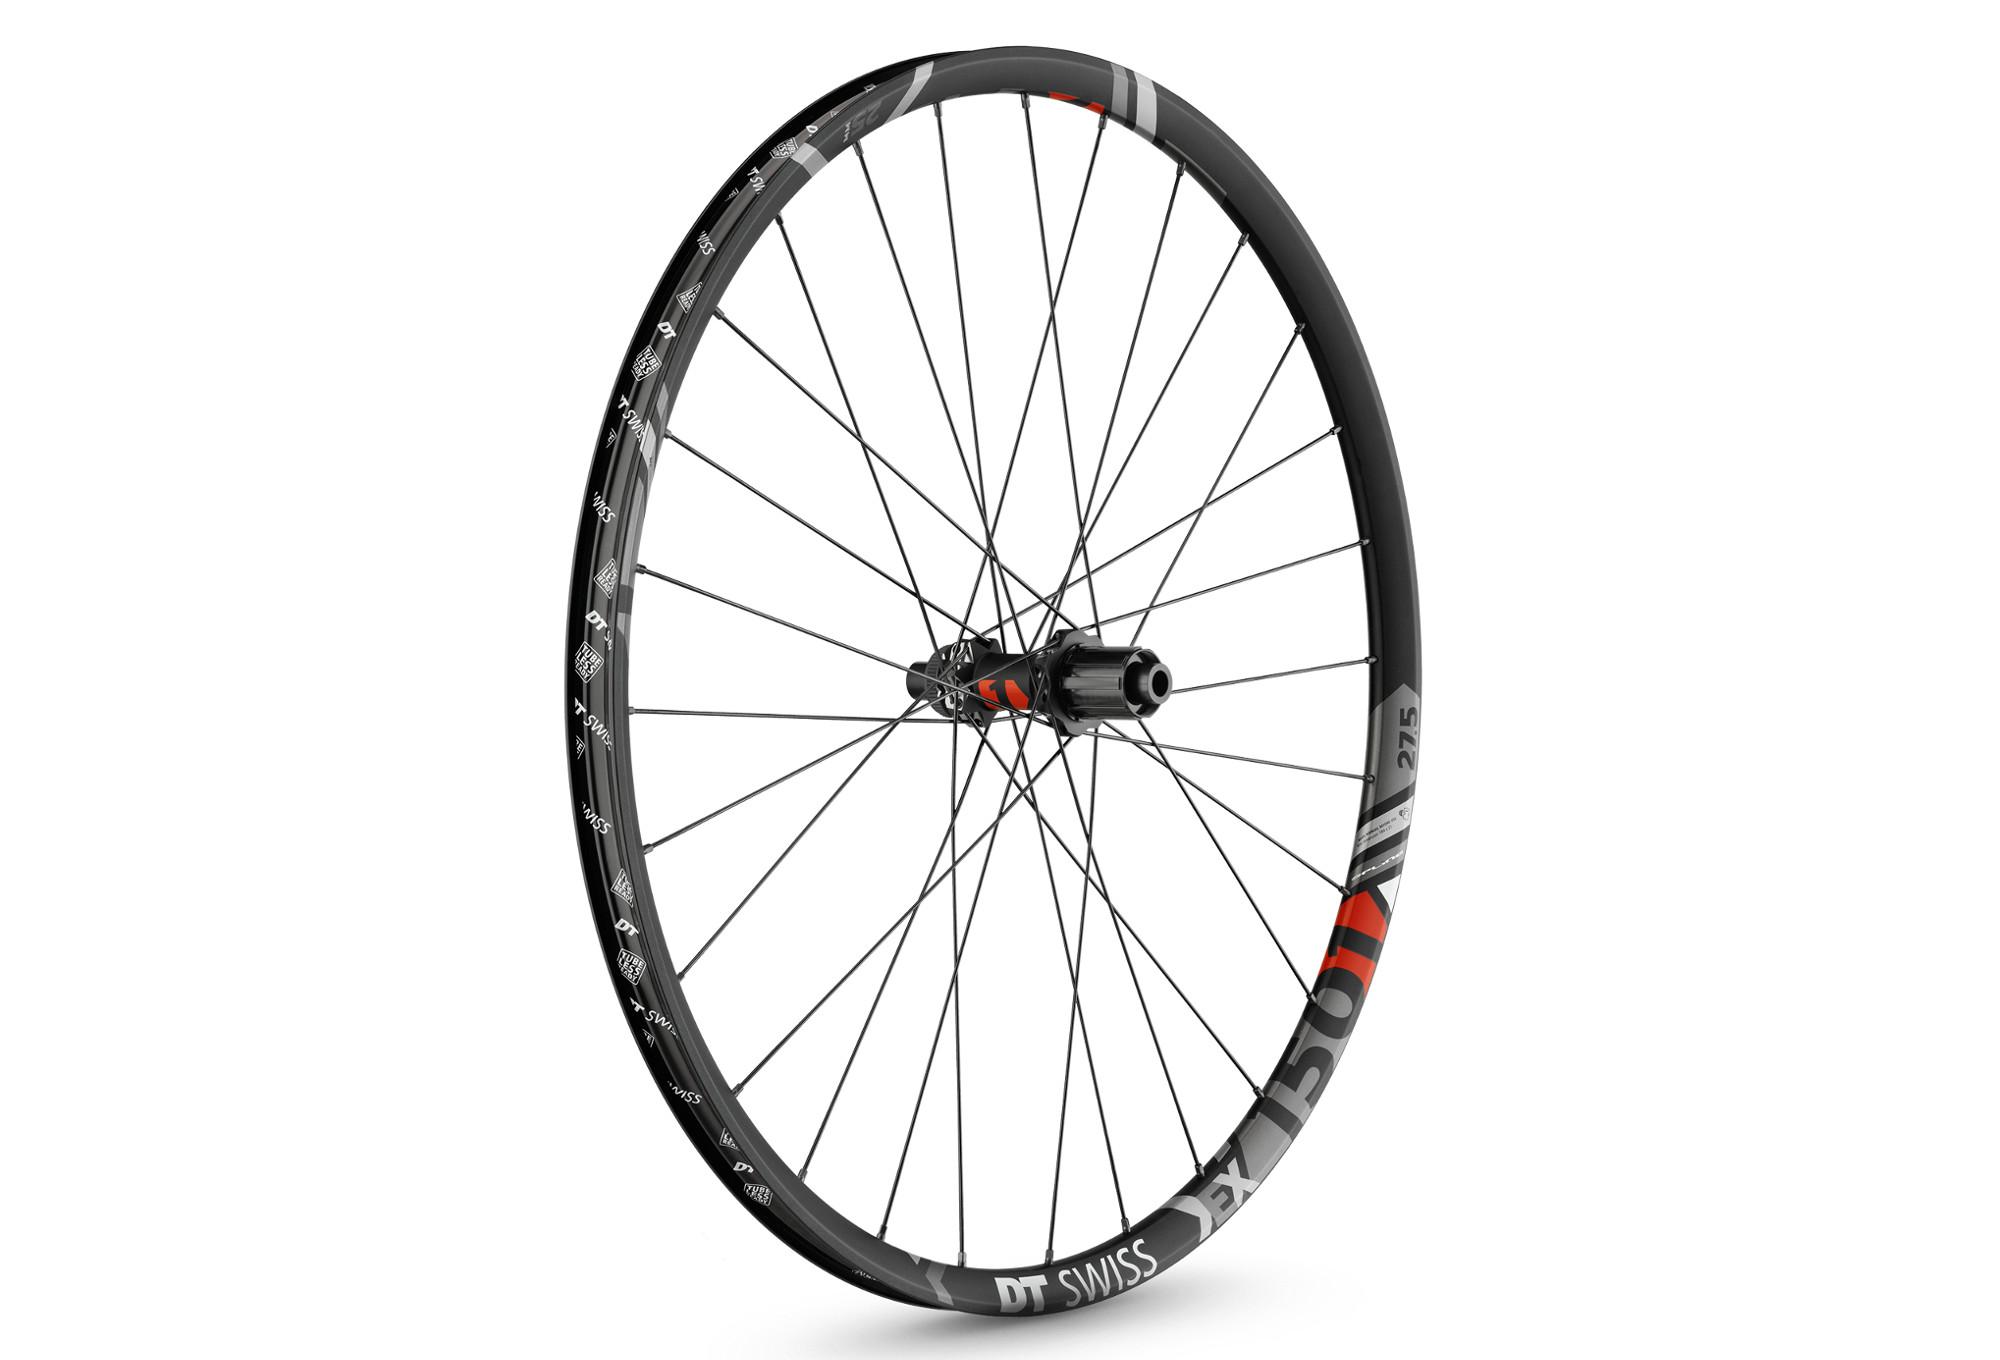 Wheelset Dt Swiss Ex 1501 Spline One 275 Boost 15x11012x148